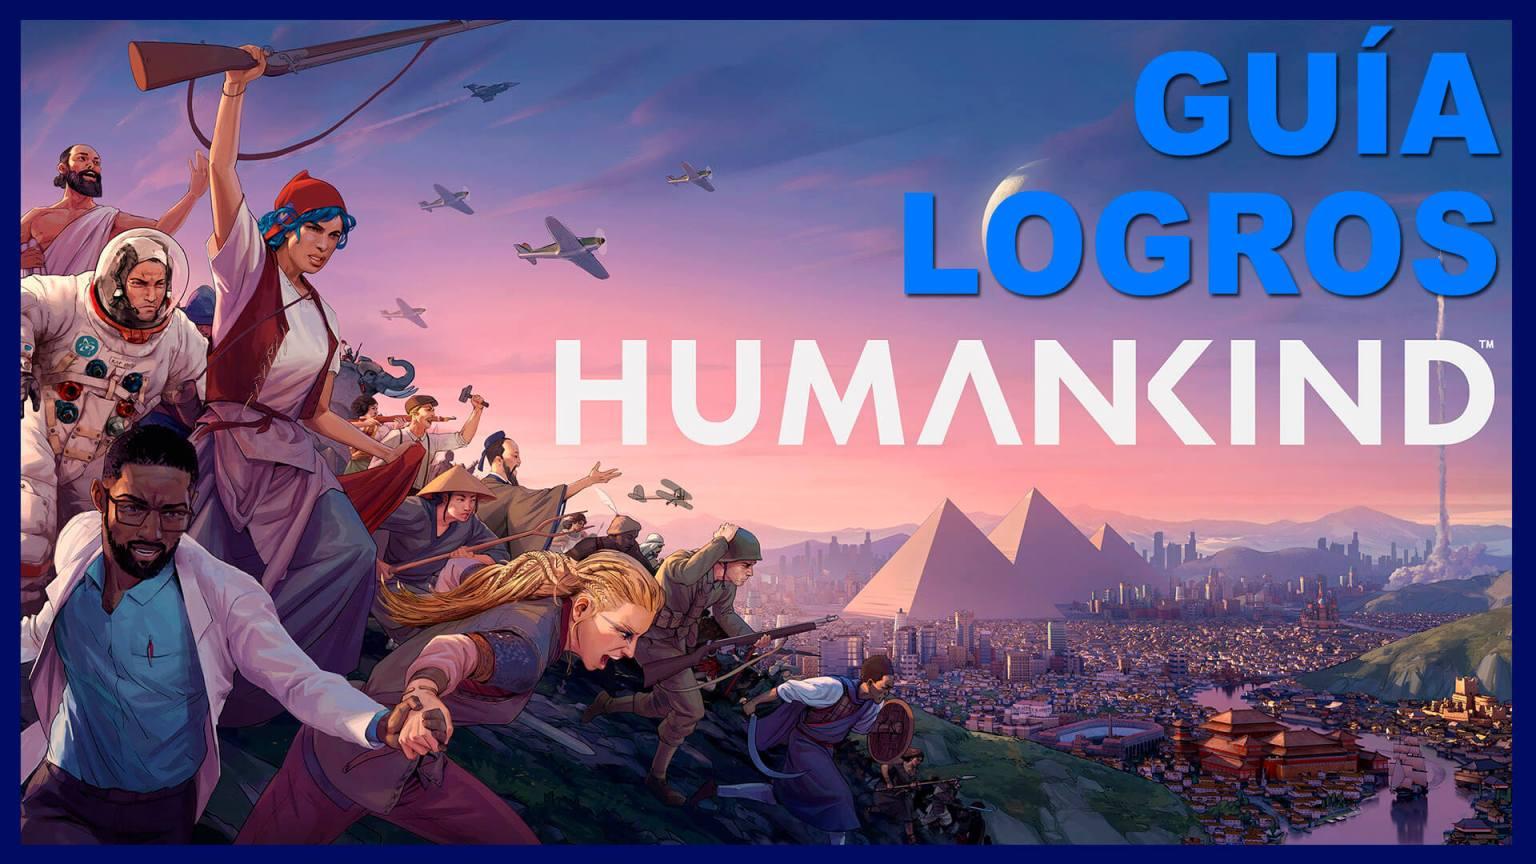 Humankind logros